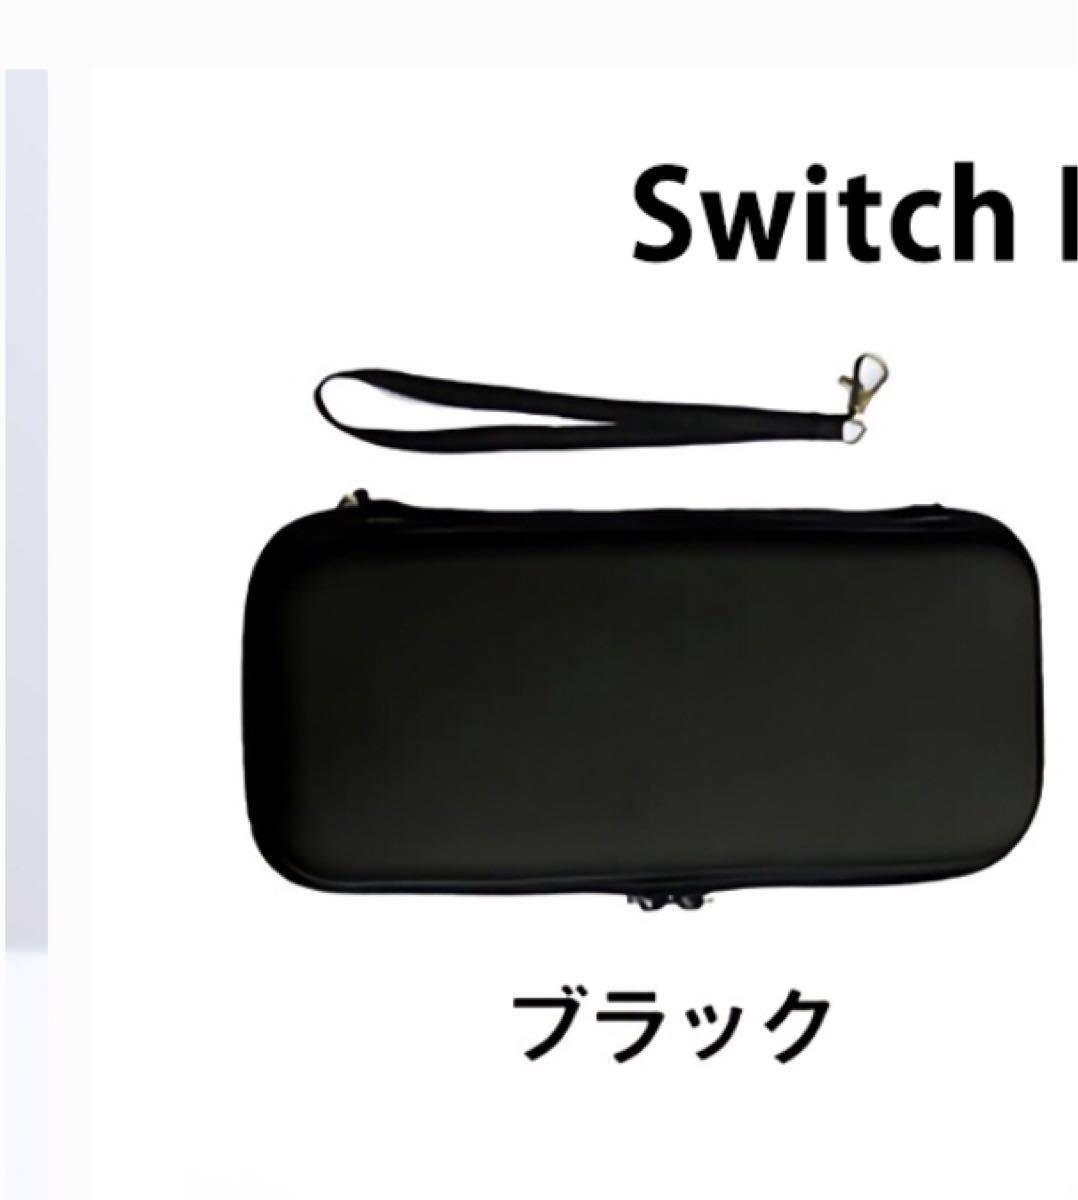 Switch ケース 耐衝撃 Nintendo Switch 収納ケース